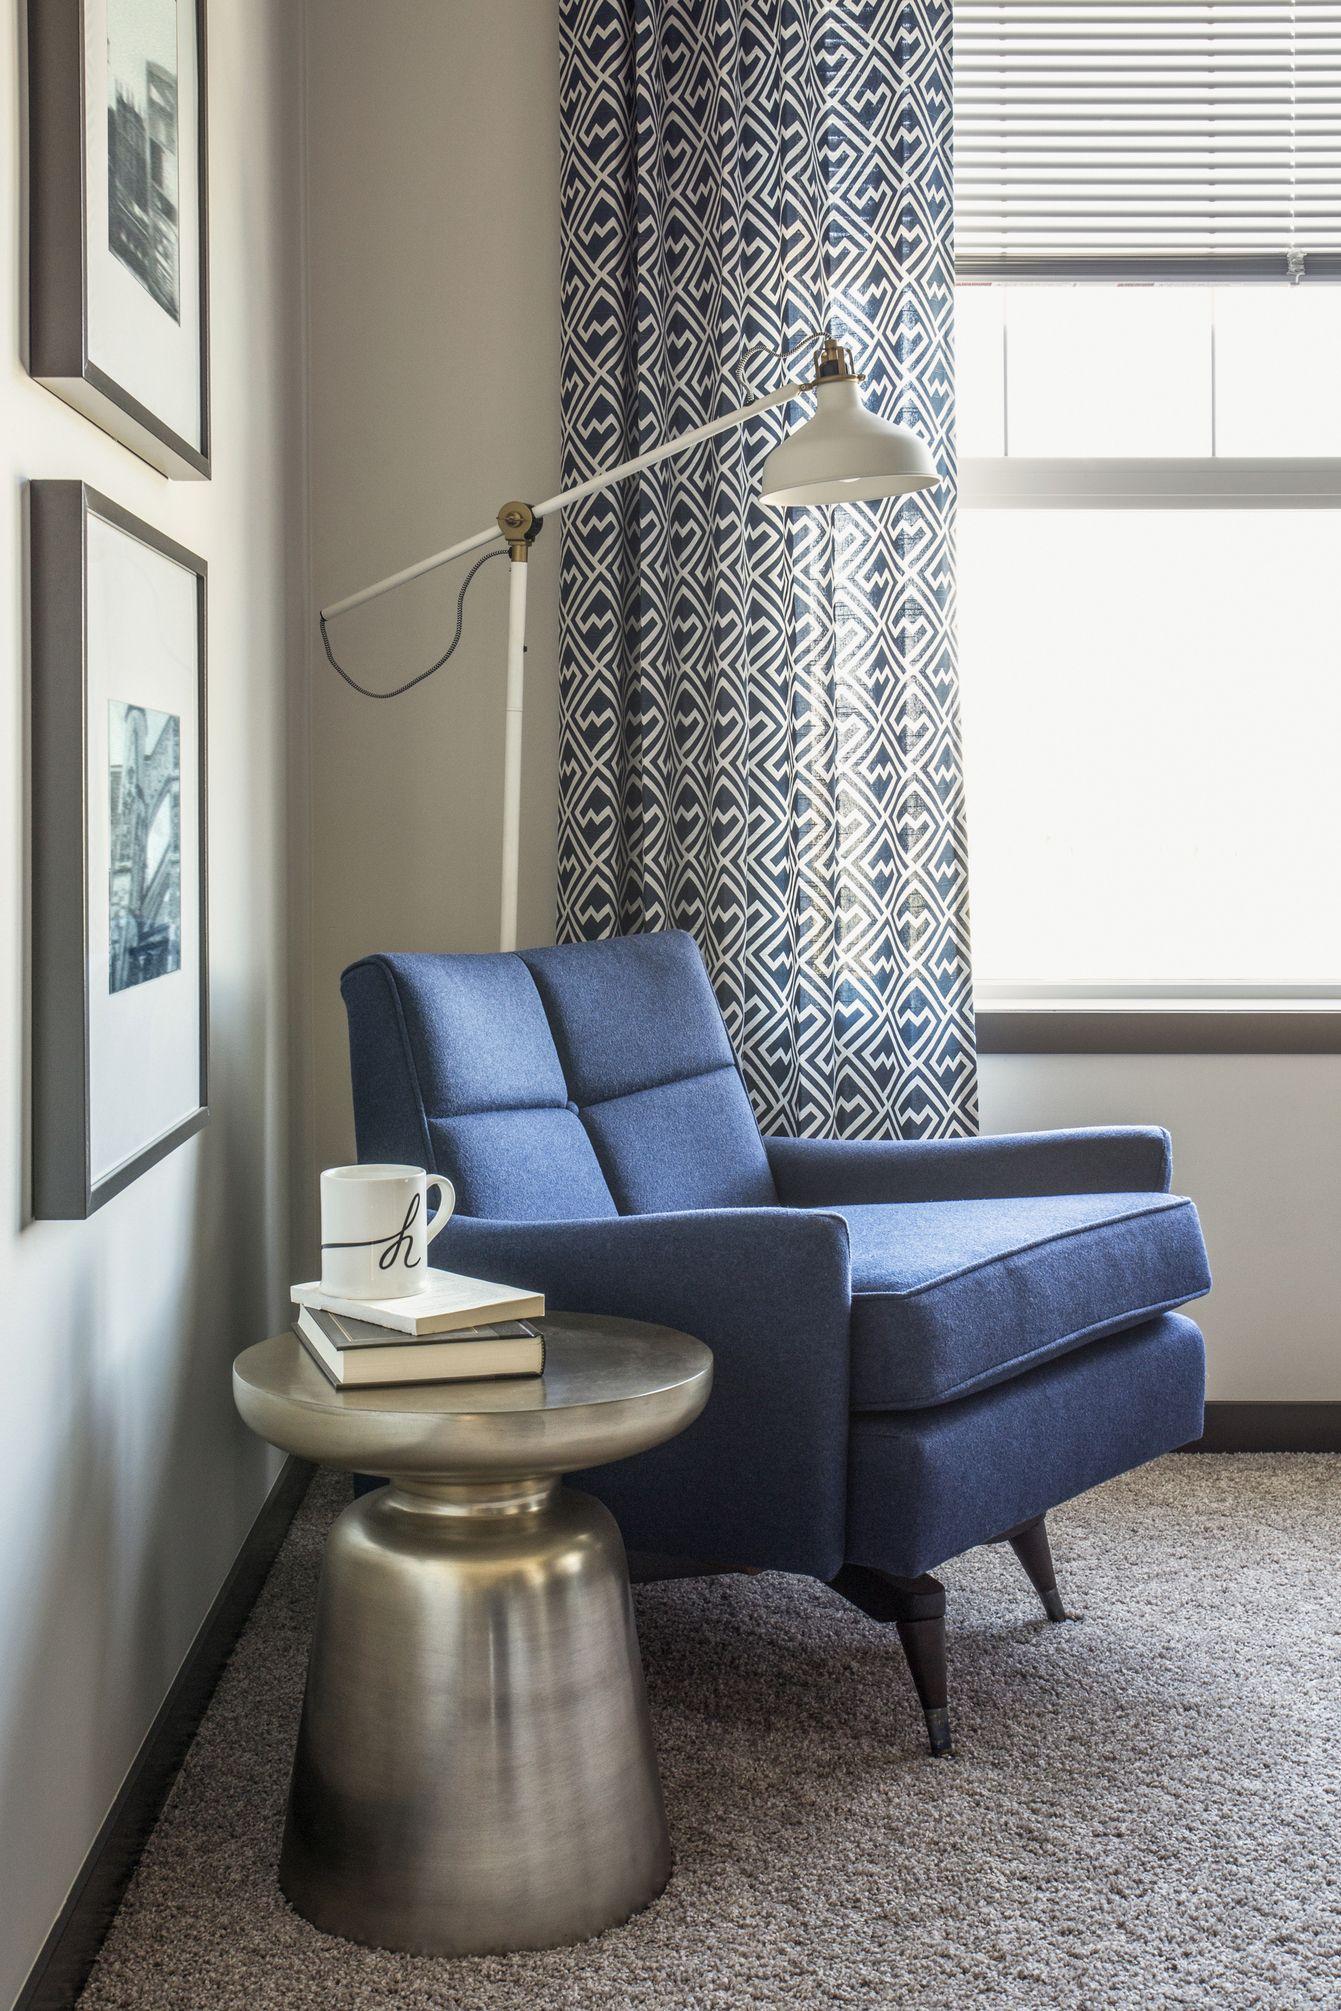 15 Family Room Decorating Ideas Designs Decor